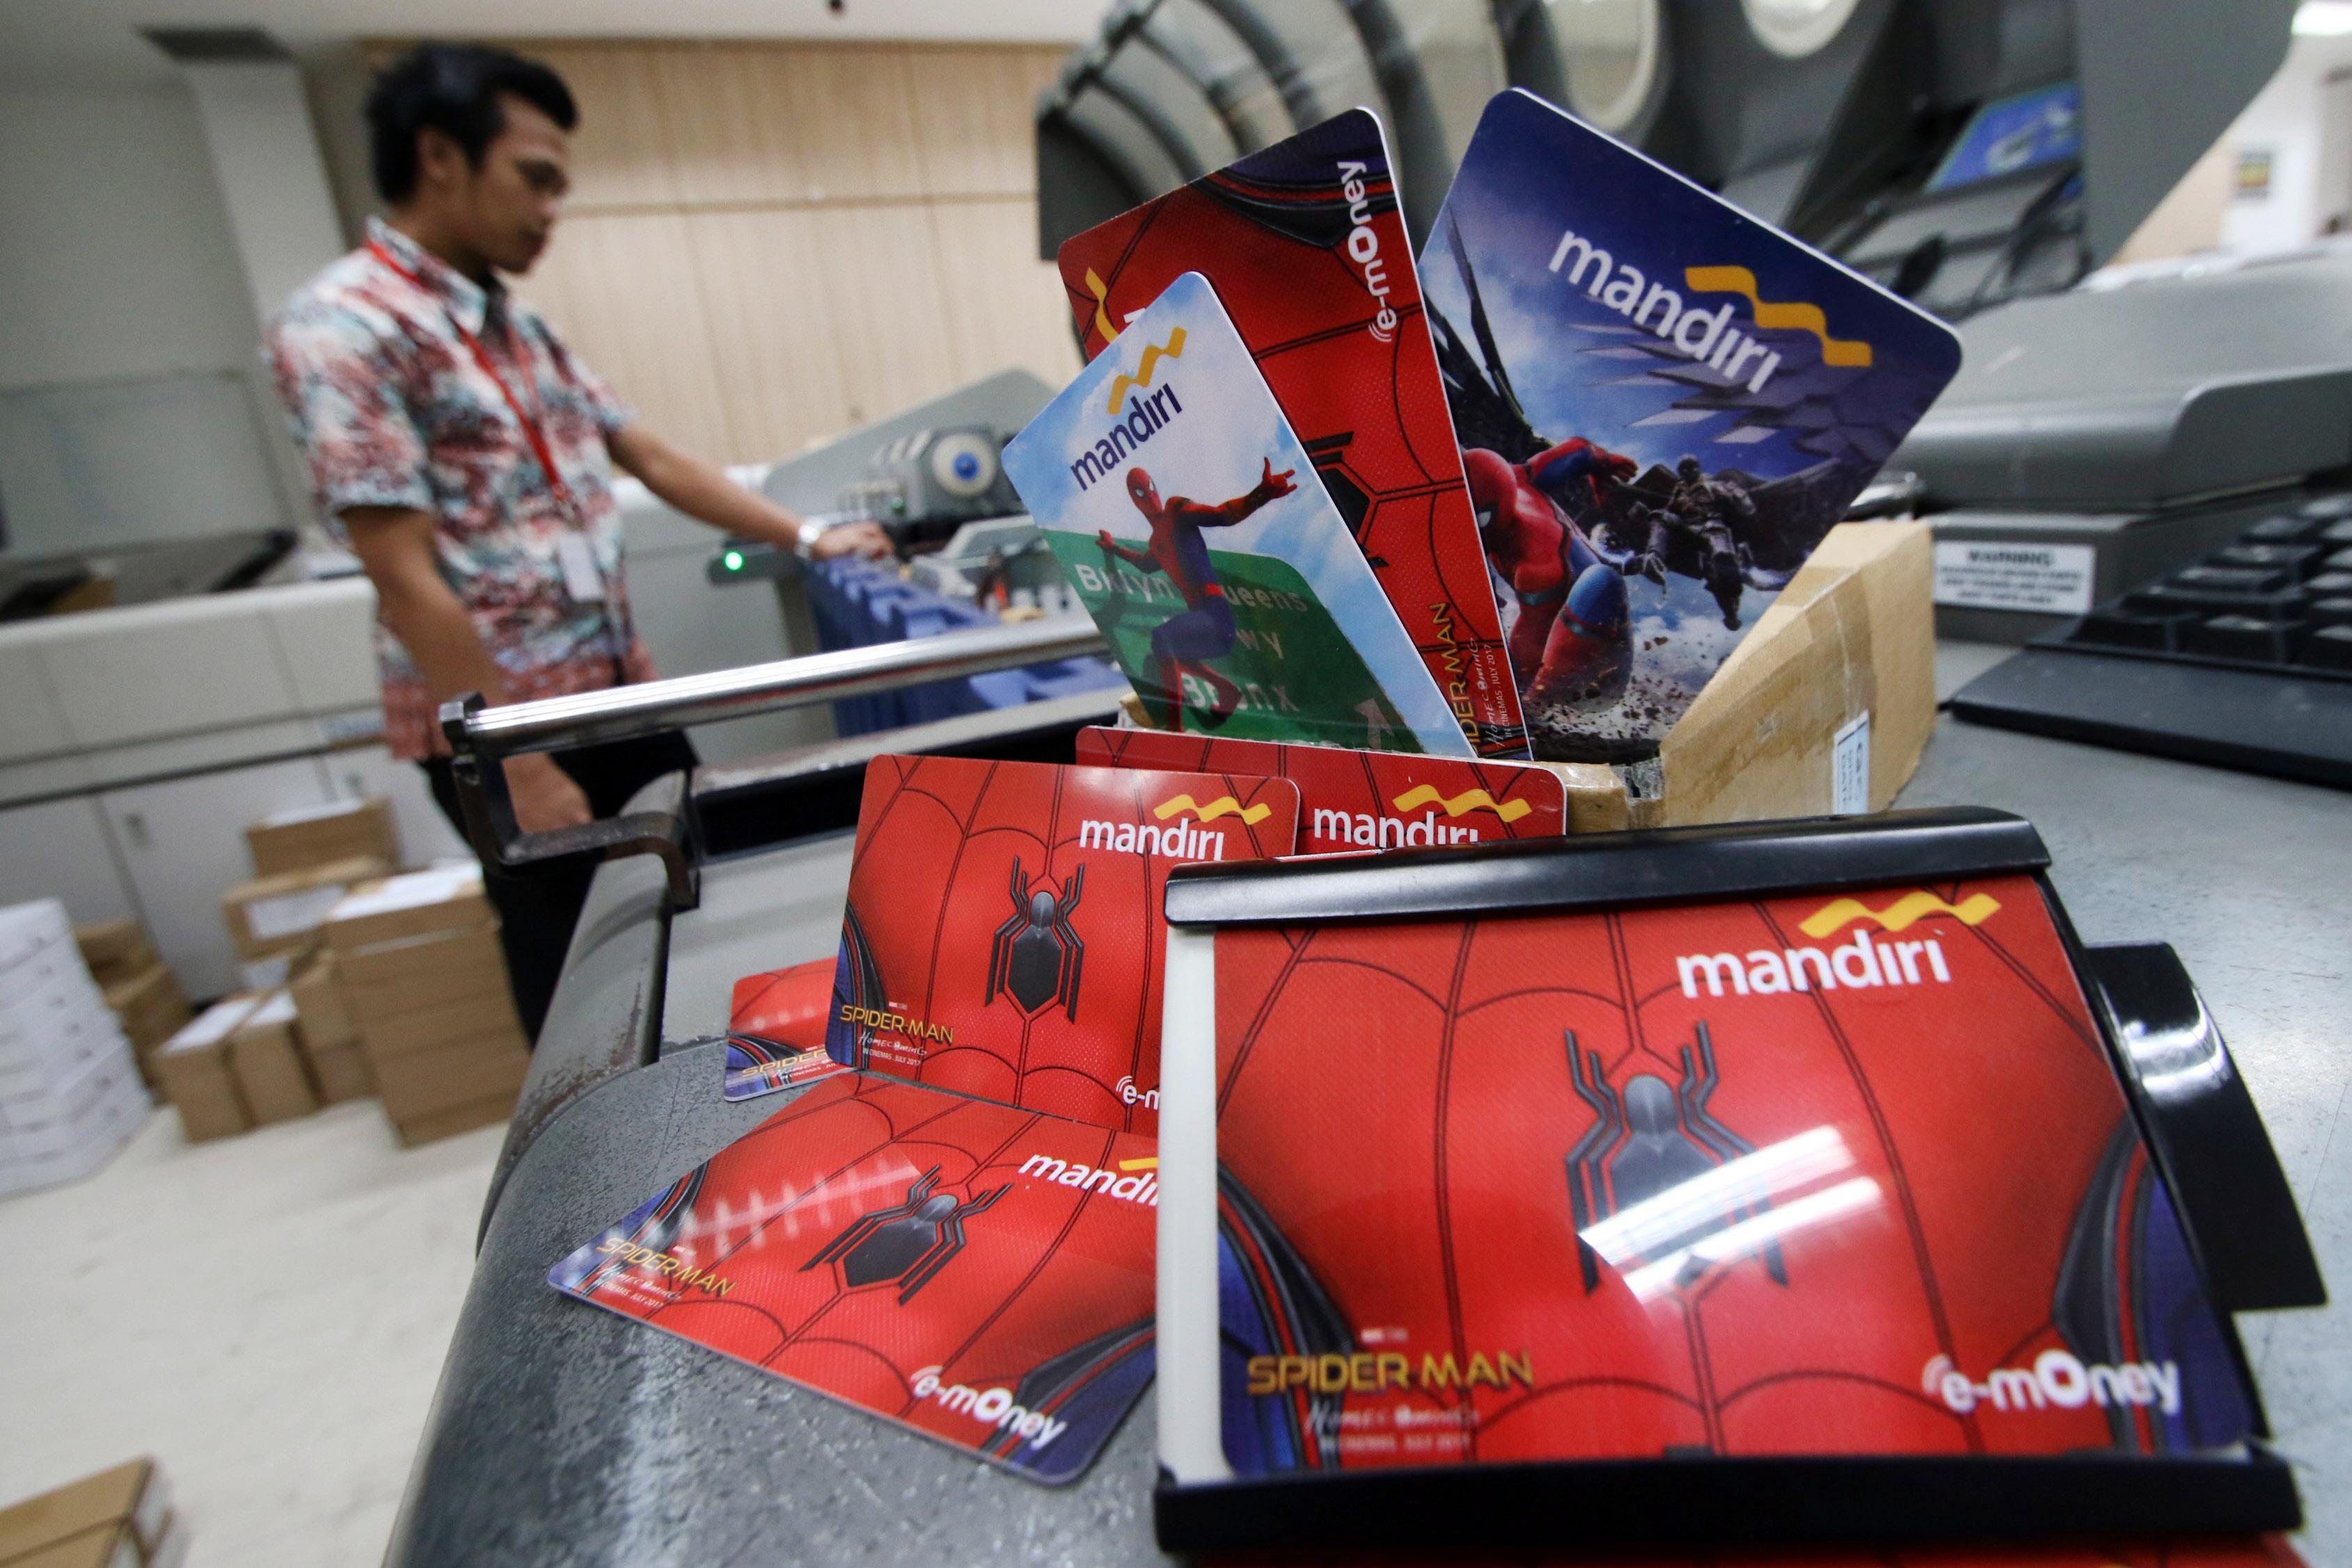 KARTU NON TUNAI. Petugas melakukan pengisian data pada u0022e-moneyu0022 atau kartu transaksi non tunai di Sentra Mandiri, Jakarta, Senin, 18 September. Foto oleh Rivan Awal Lingga/ANTARA